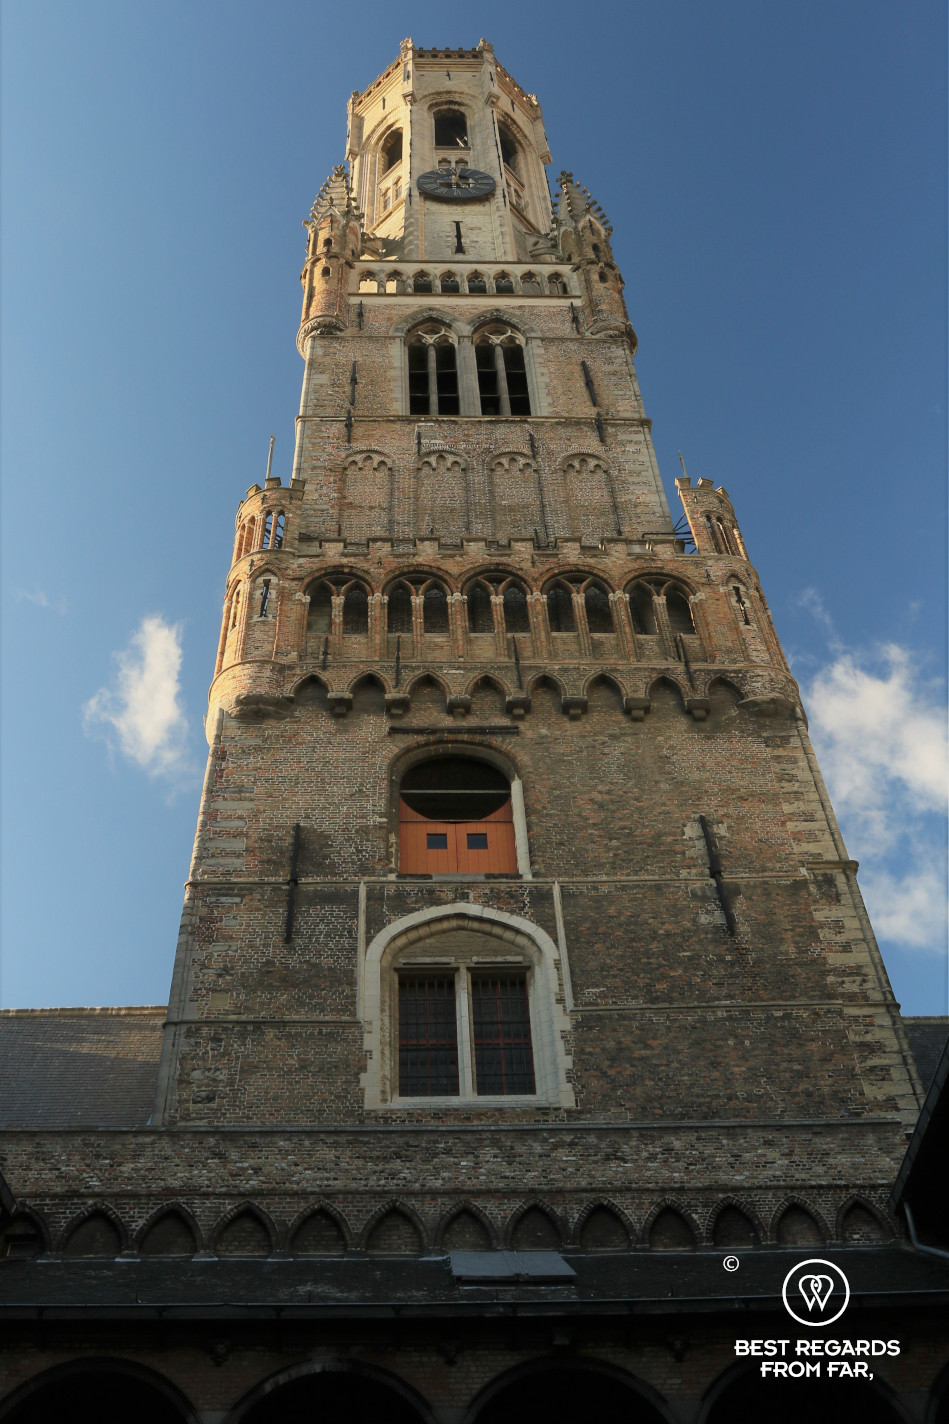 The Belfry of Bruges, Belgium, against a blue sky.